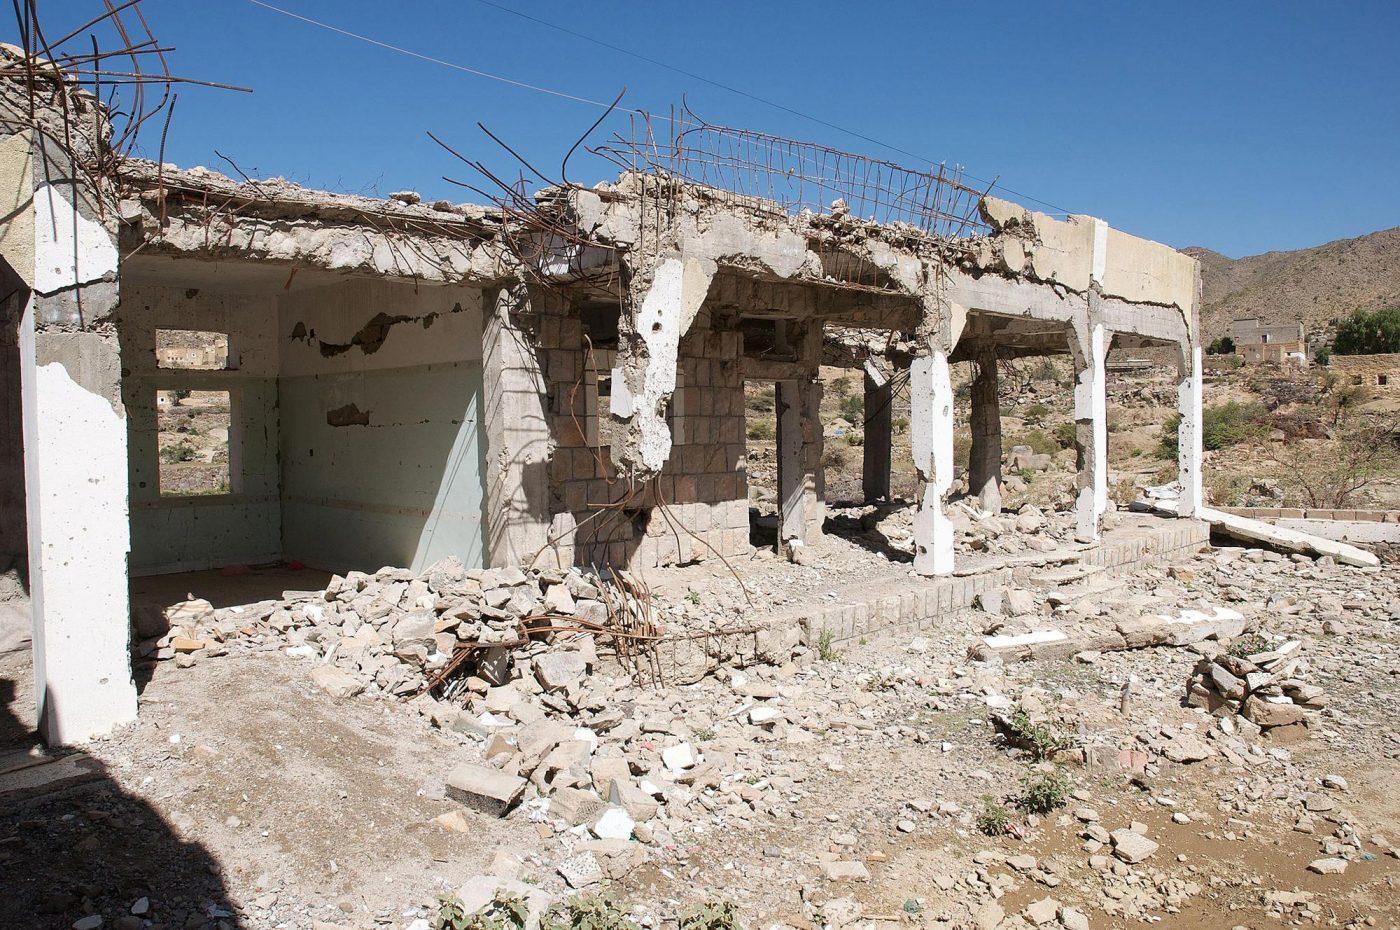 Yemen. Questa è una scuola aperta